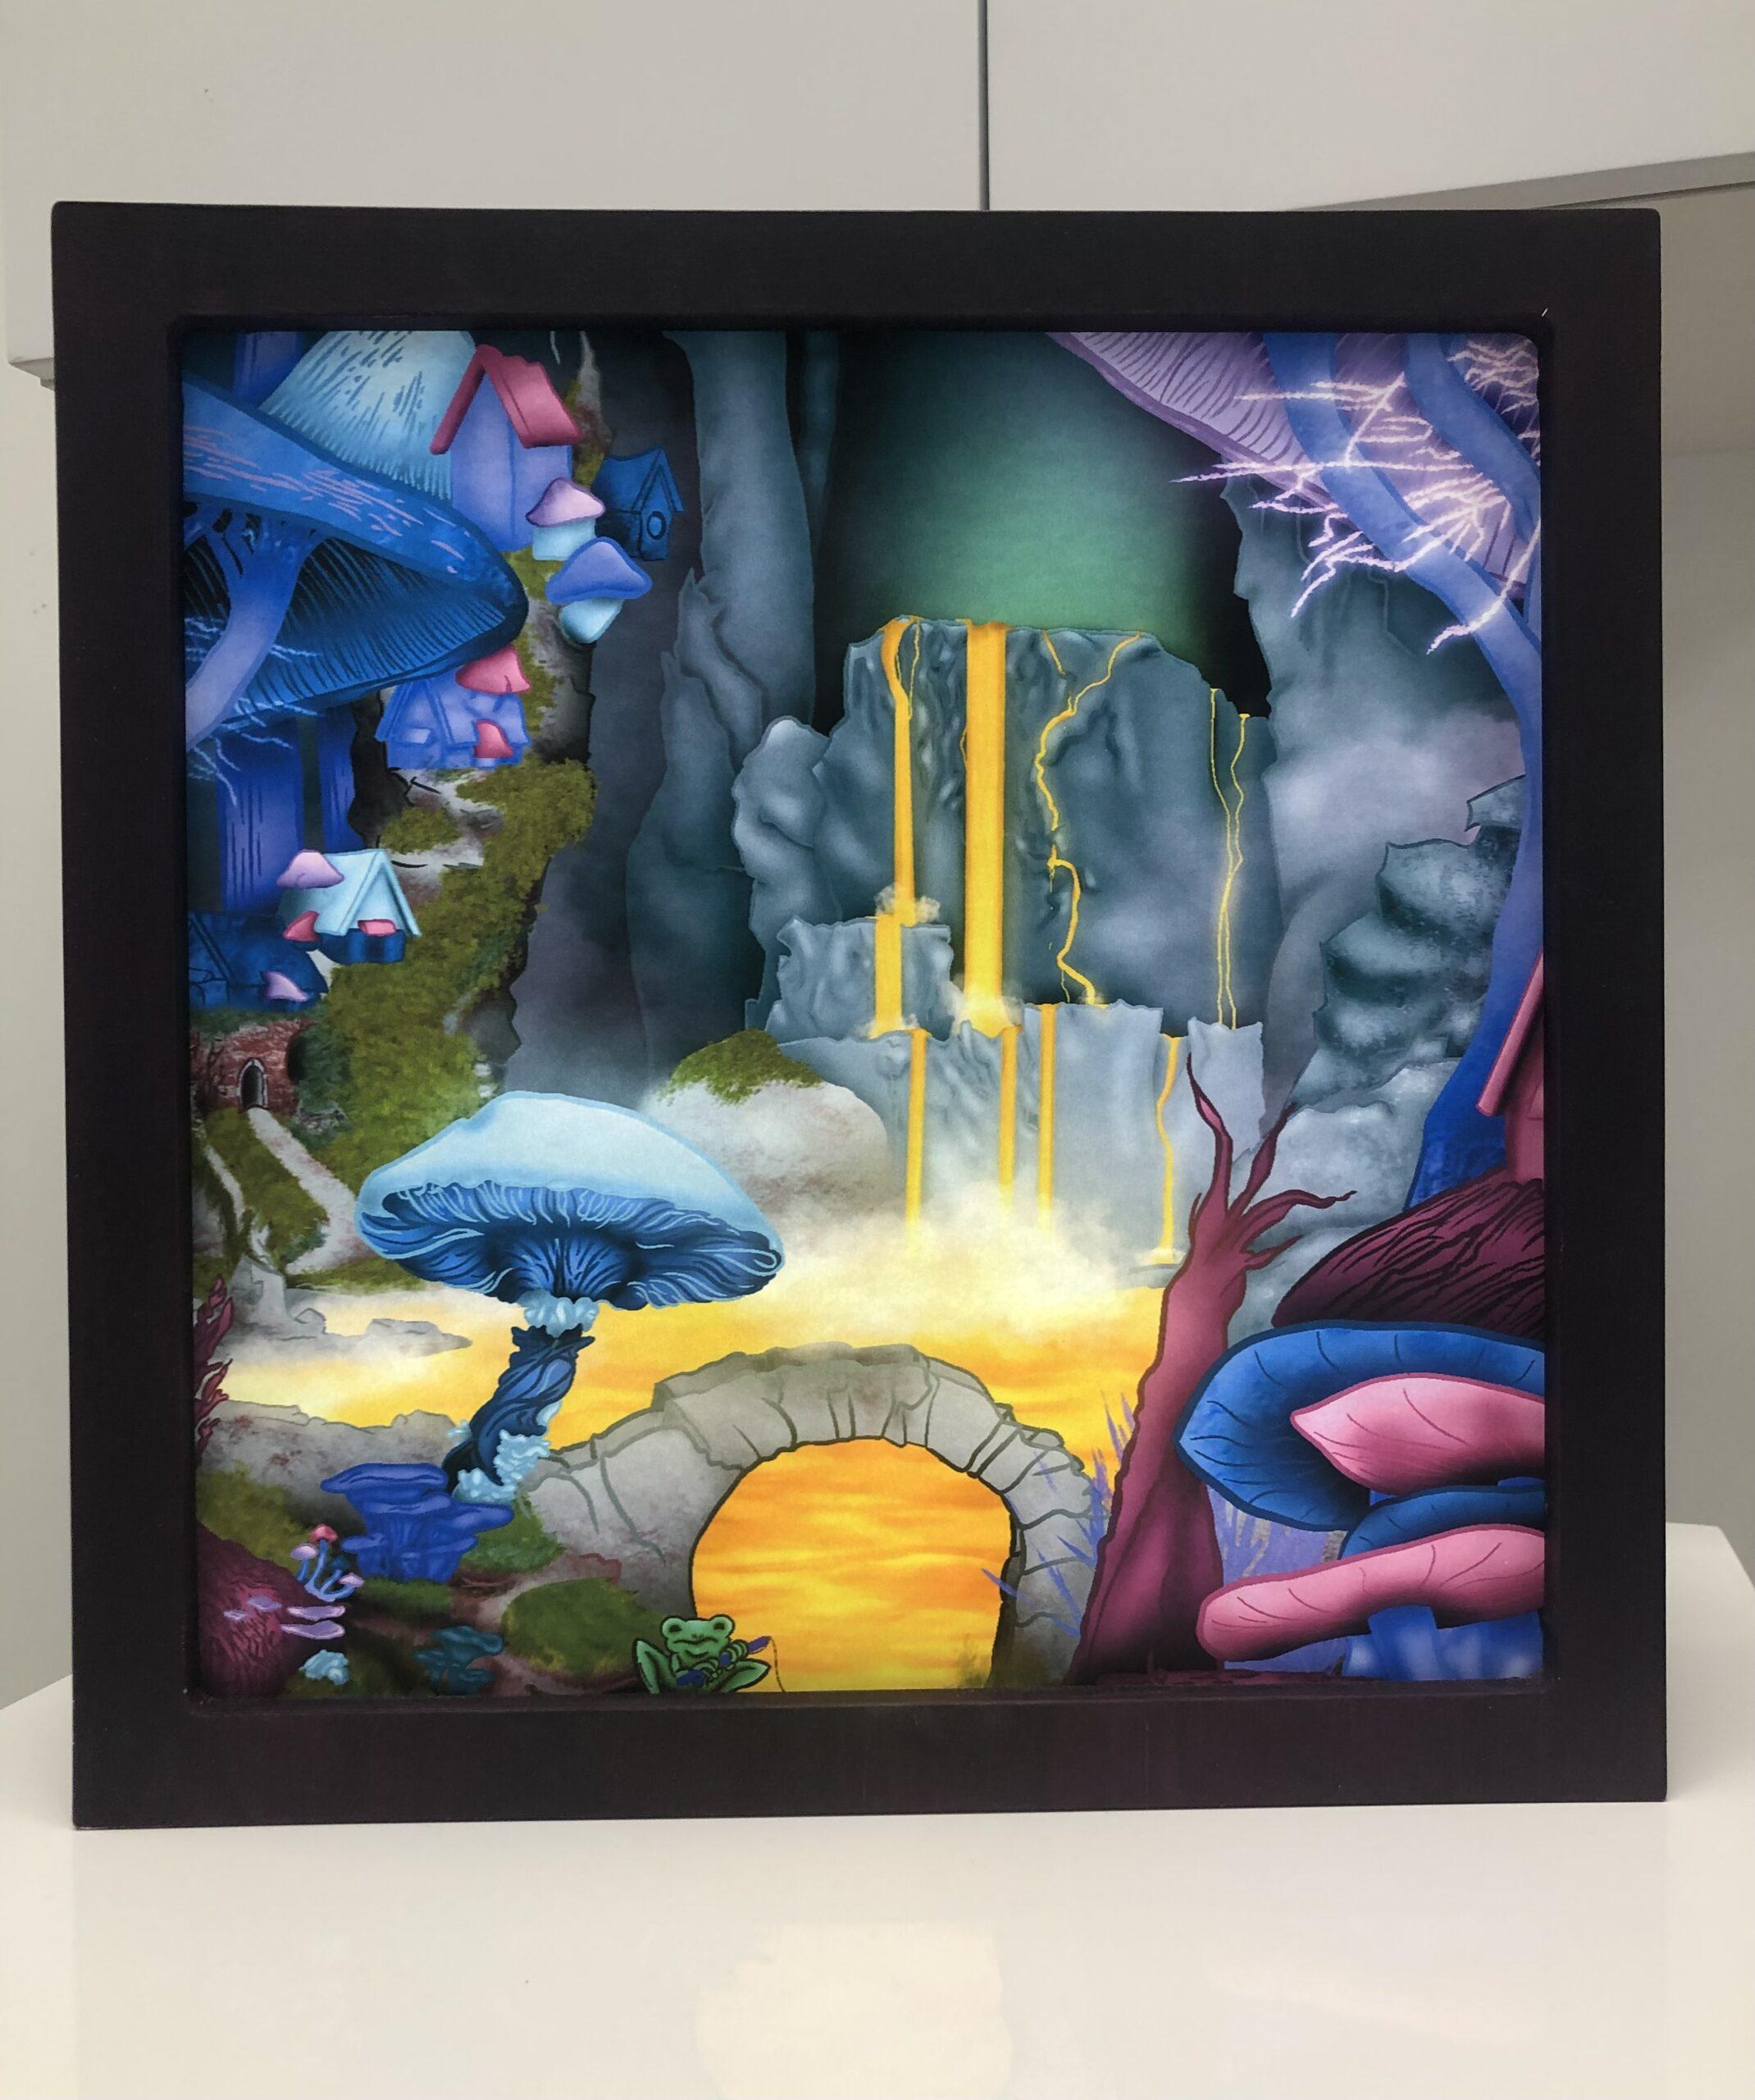 'Shy Little Frog' Light Box, Amaria Kee Huaki $400 (350x350mm)